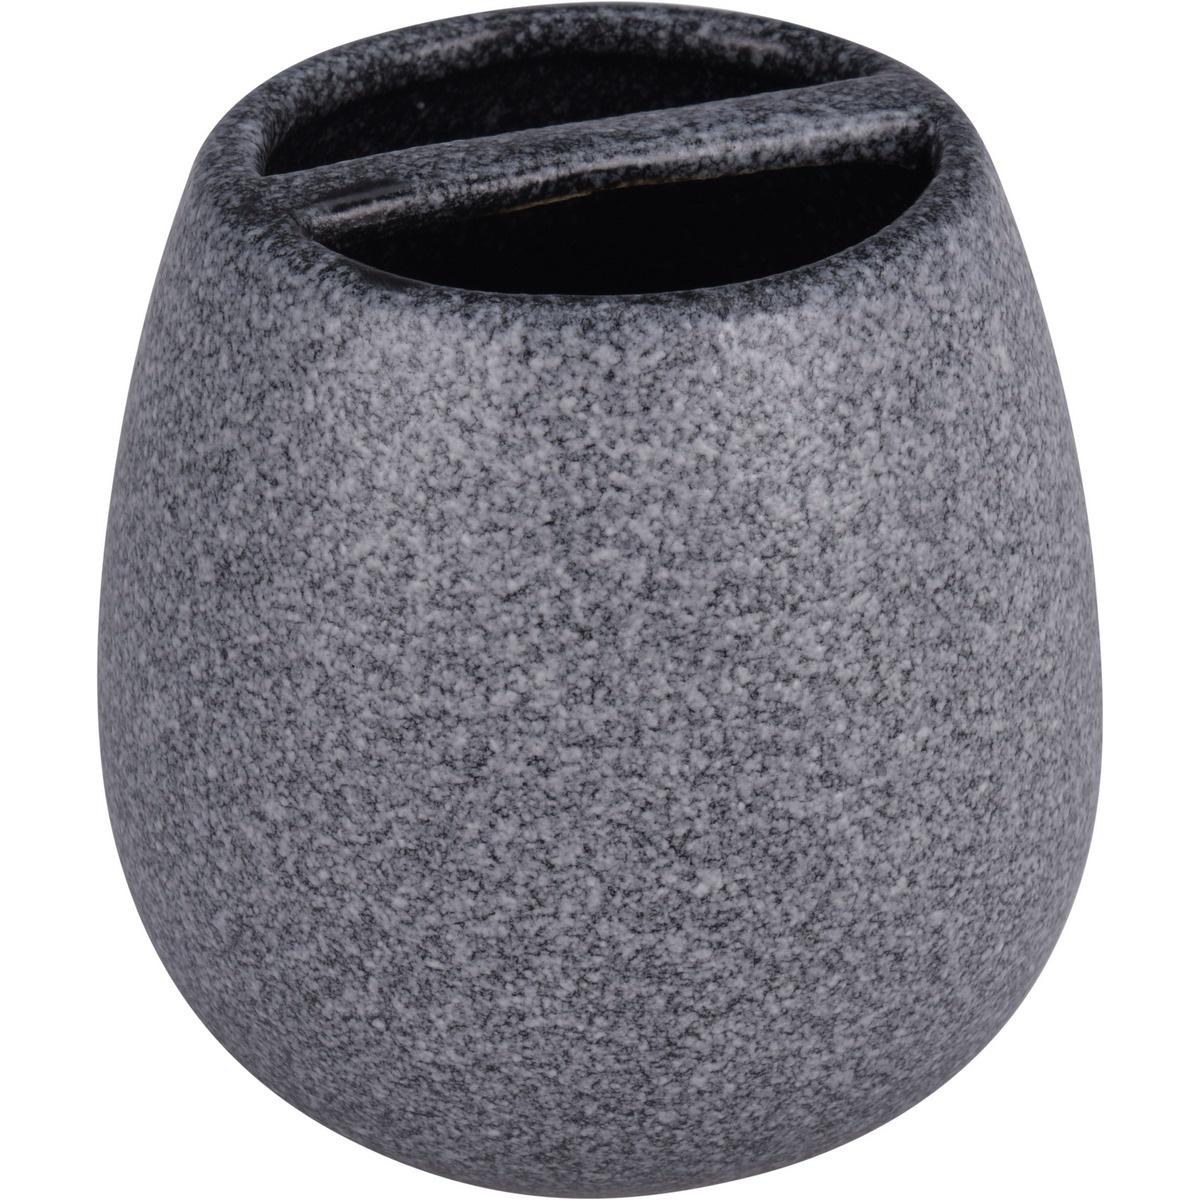 Koopman Stojan na kartáčky Stone, pr. 9,5 cm